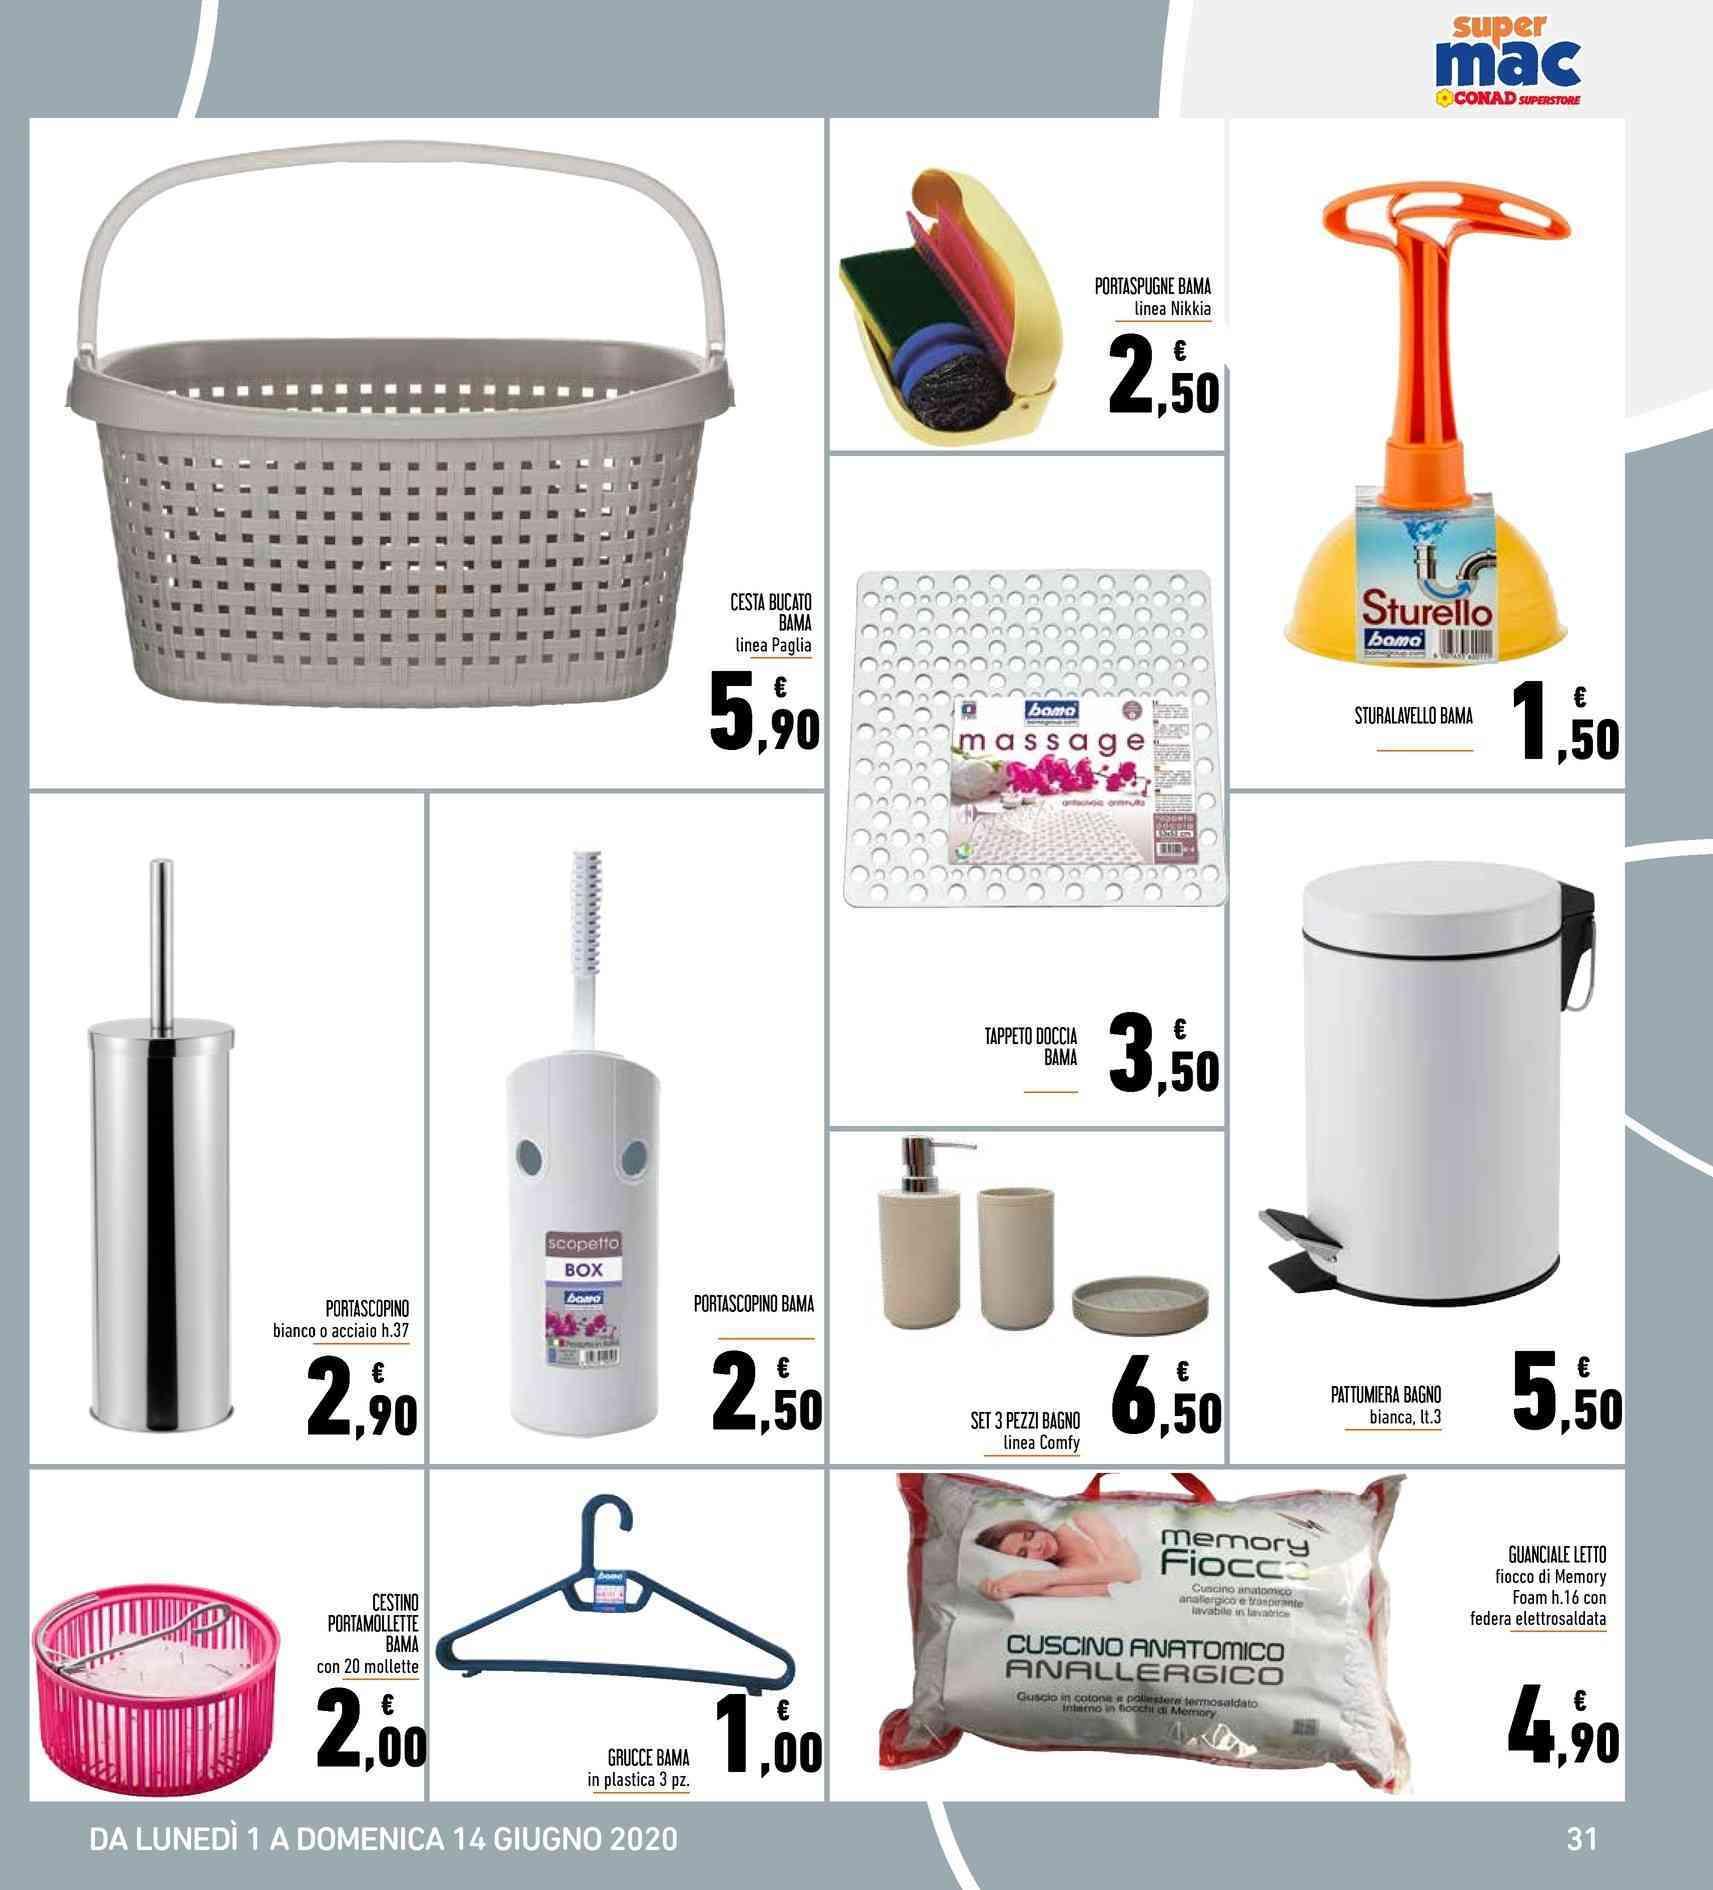 Cesta Bucato Leroy Merlin offerte box doccia, negozi per arredare casa - promoqui